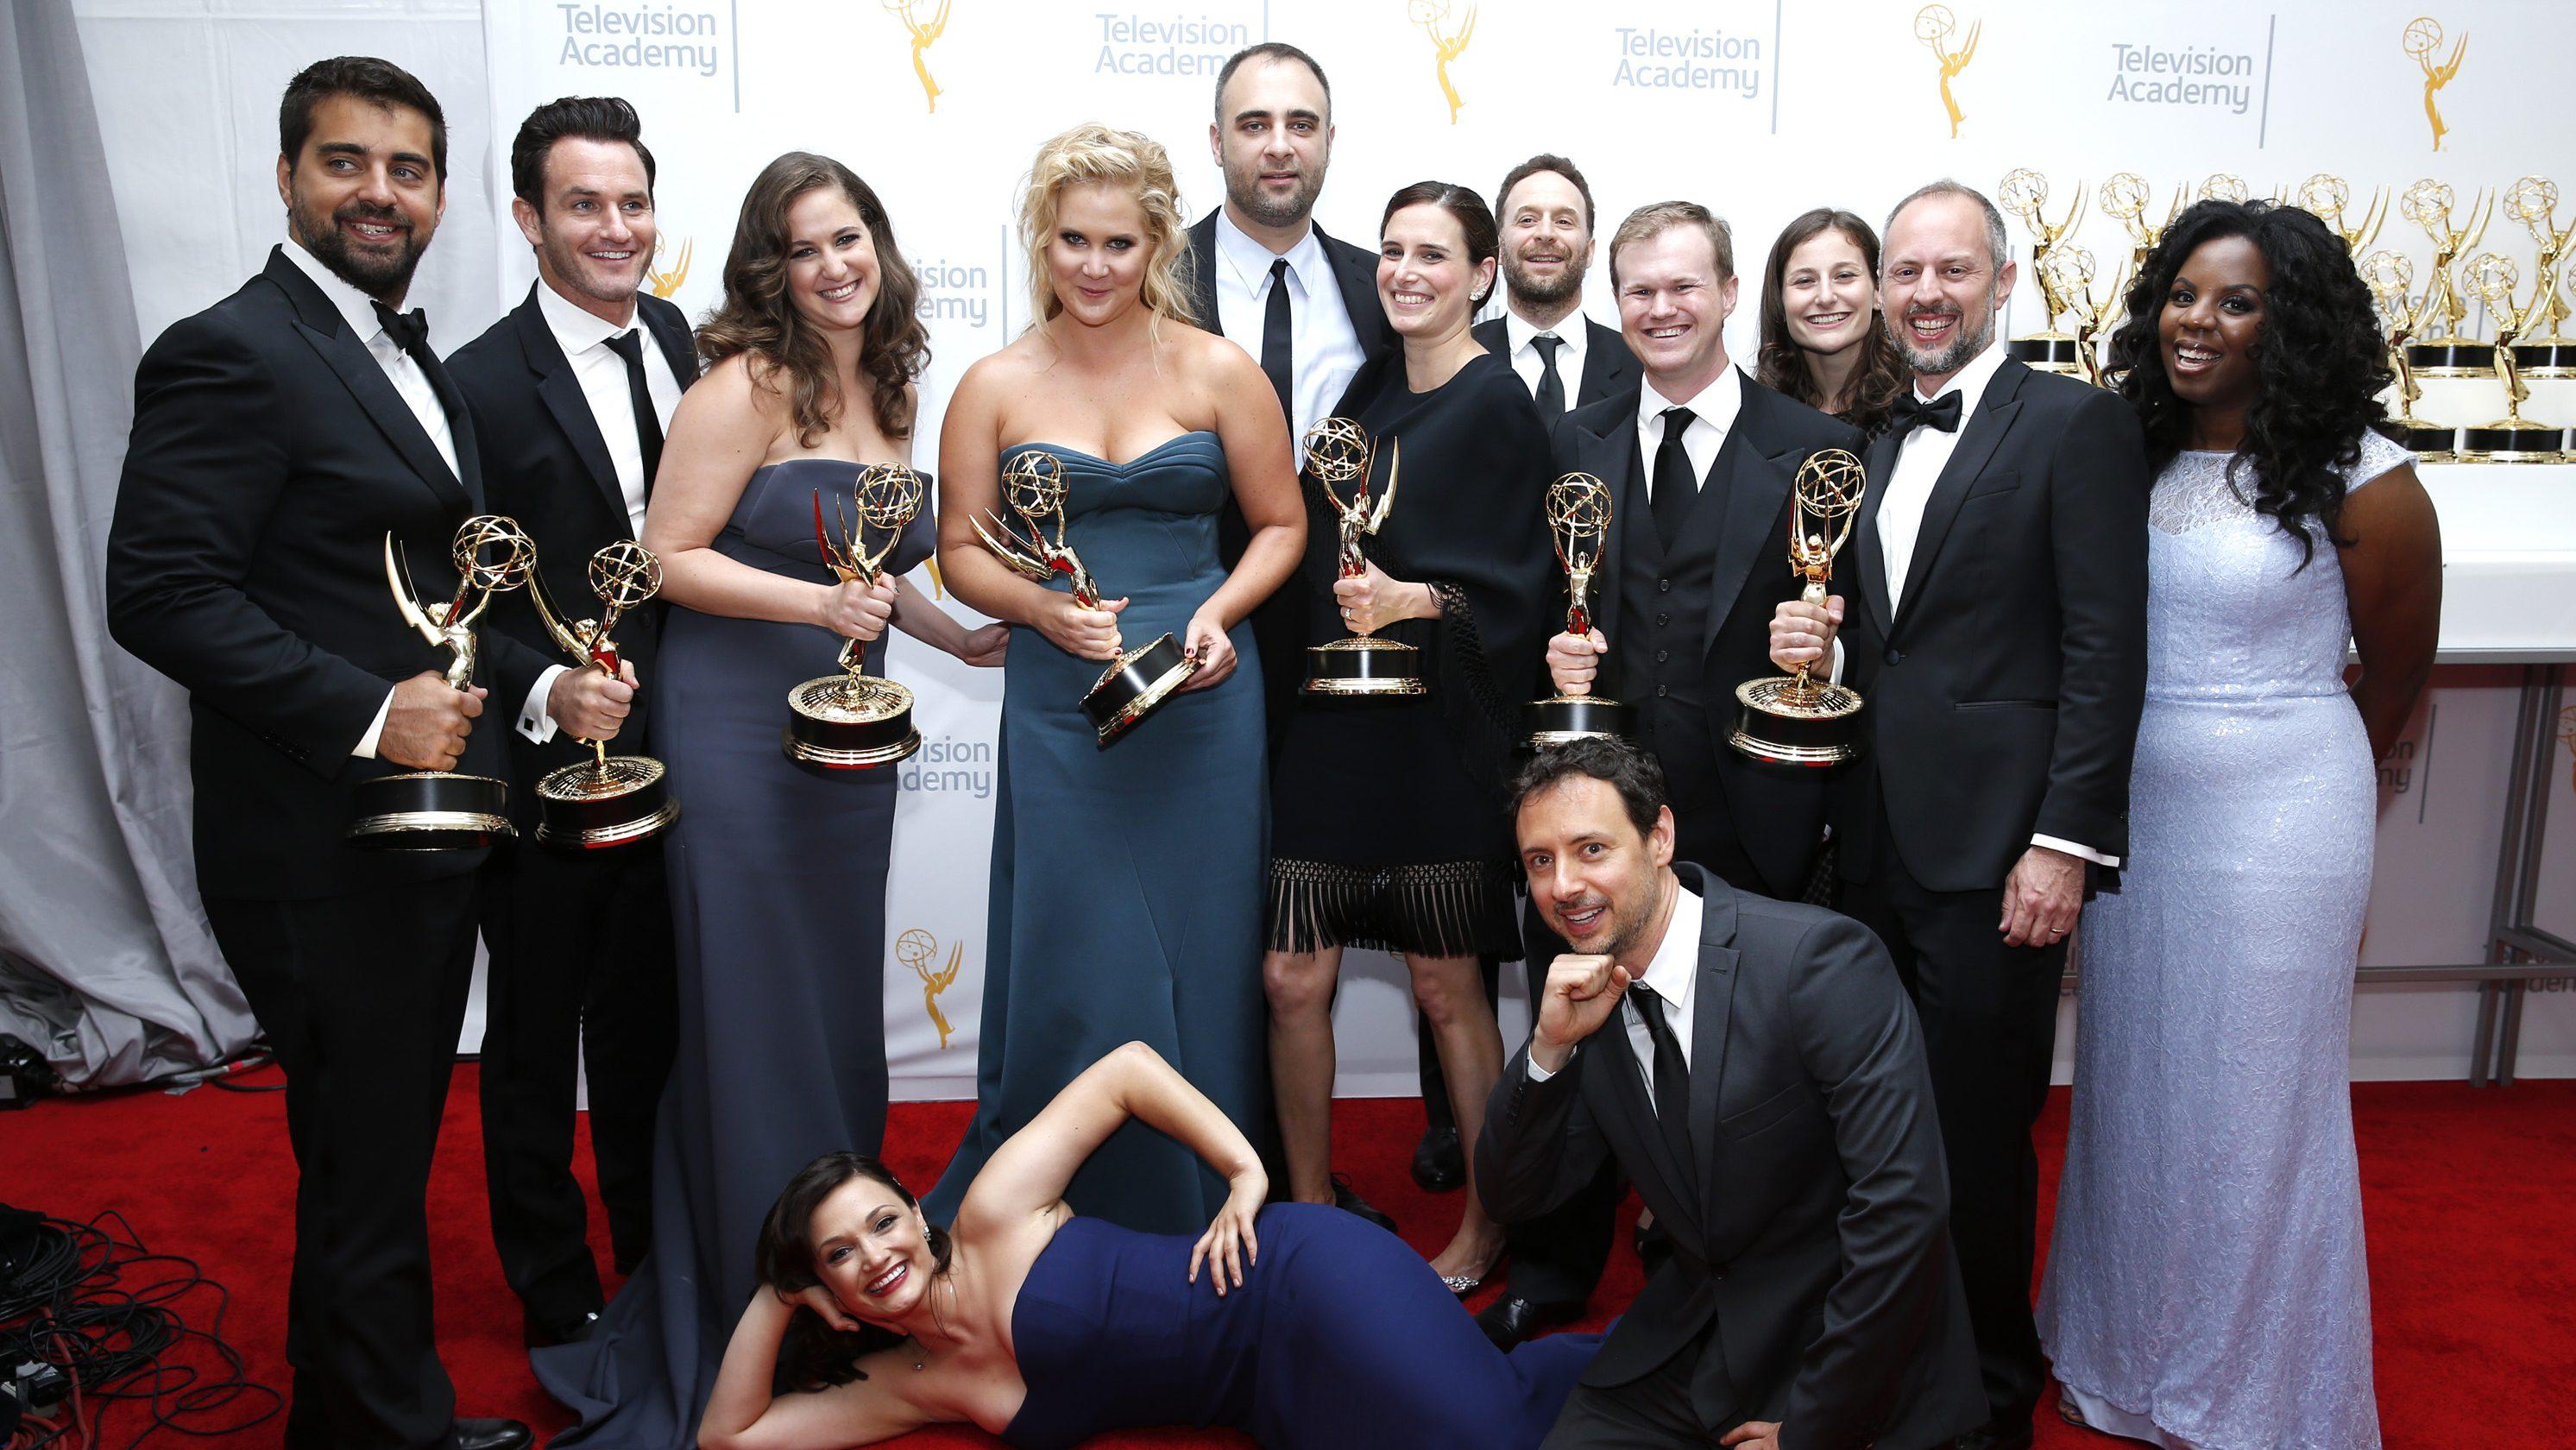 67th Primetime Emmy Awards - Amy Schumer Inside Amy Schumer cast crew